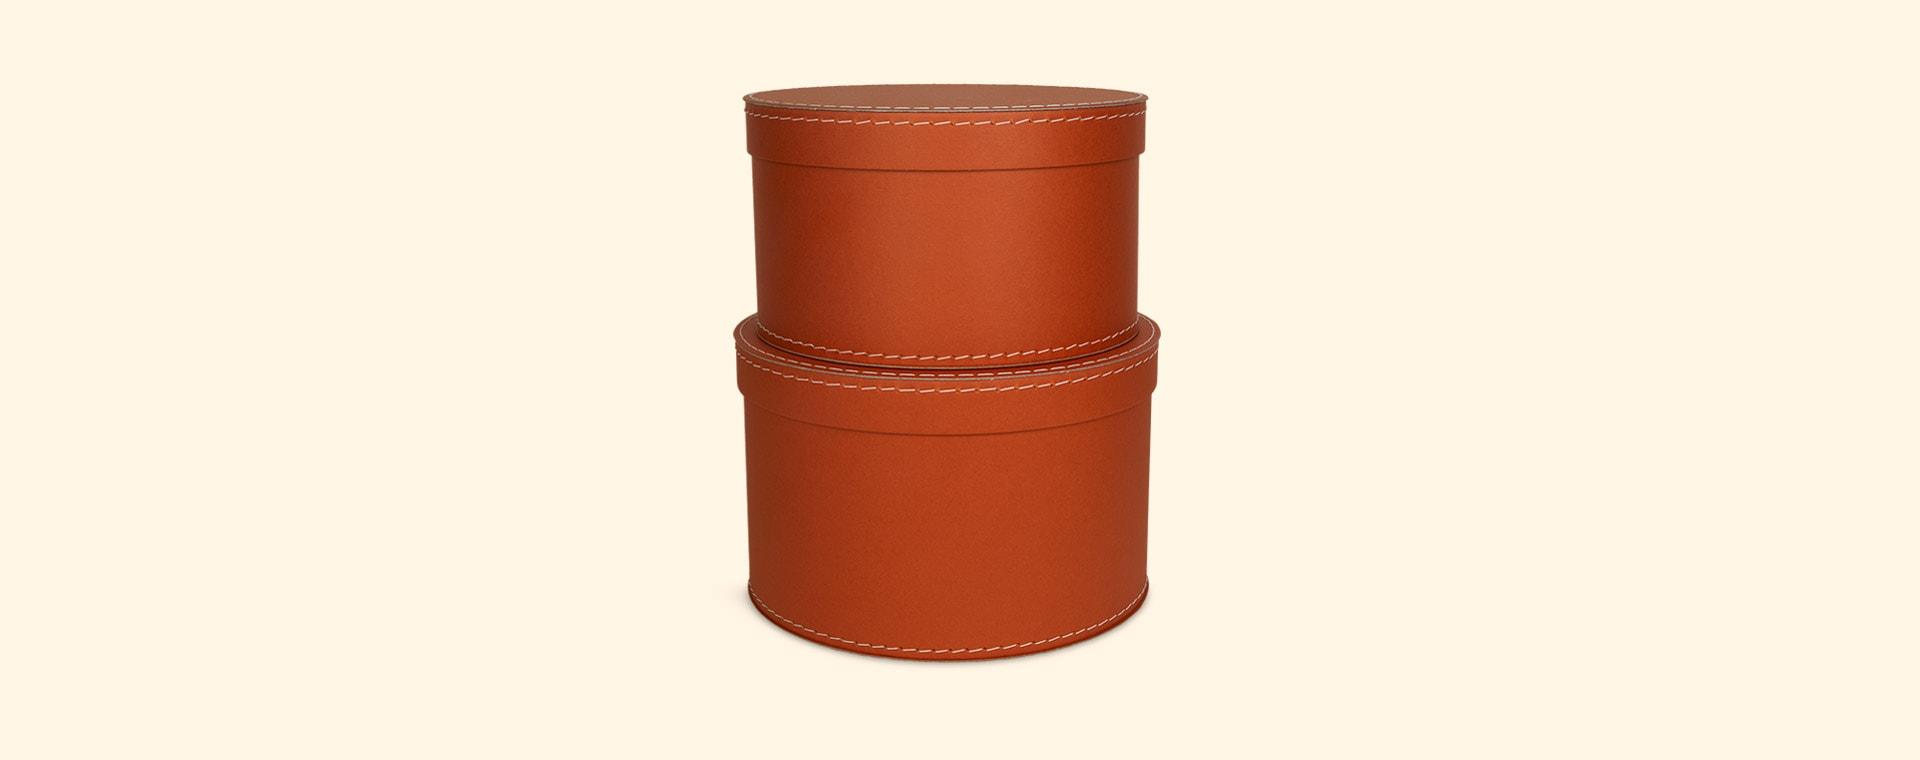 Rust Kid's Concept Round Storage Boxes Set of 2